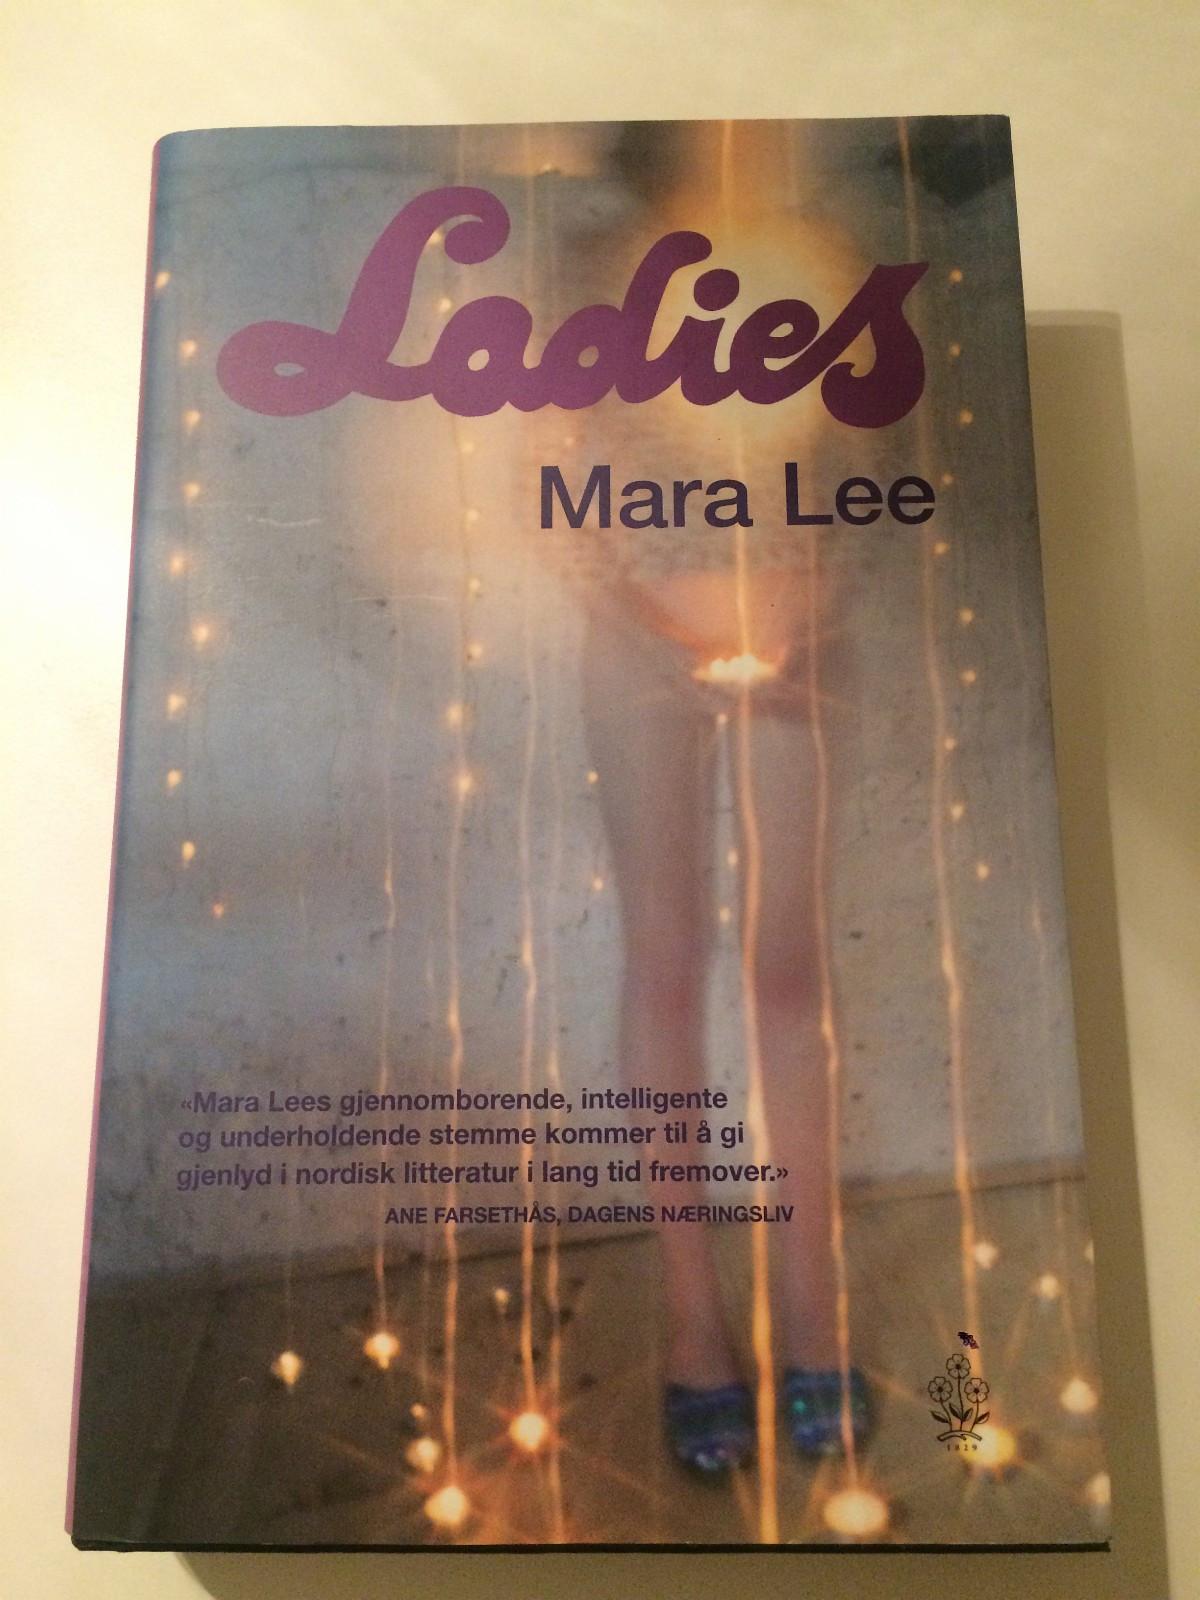 Roman Ladies av Mara Lee - Horten  - Ladies - Horten